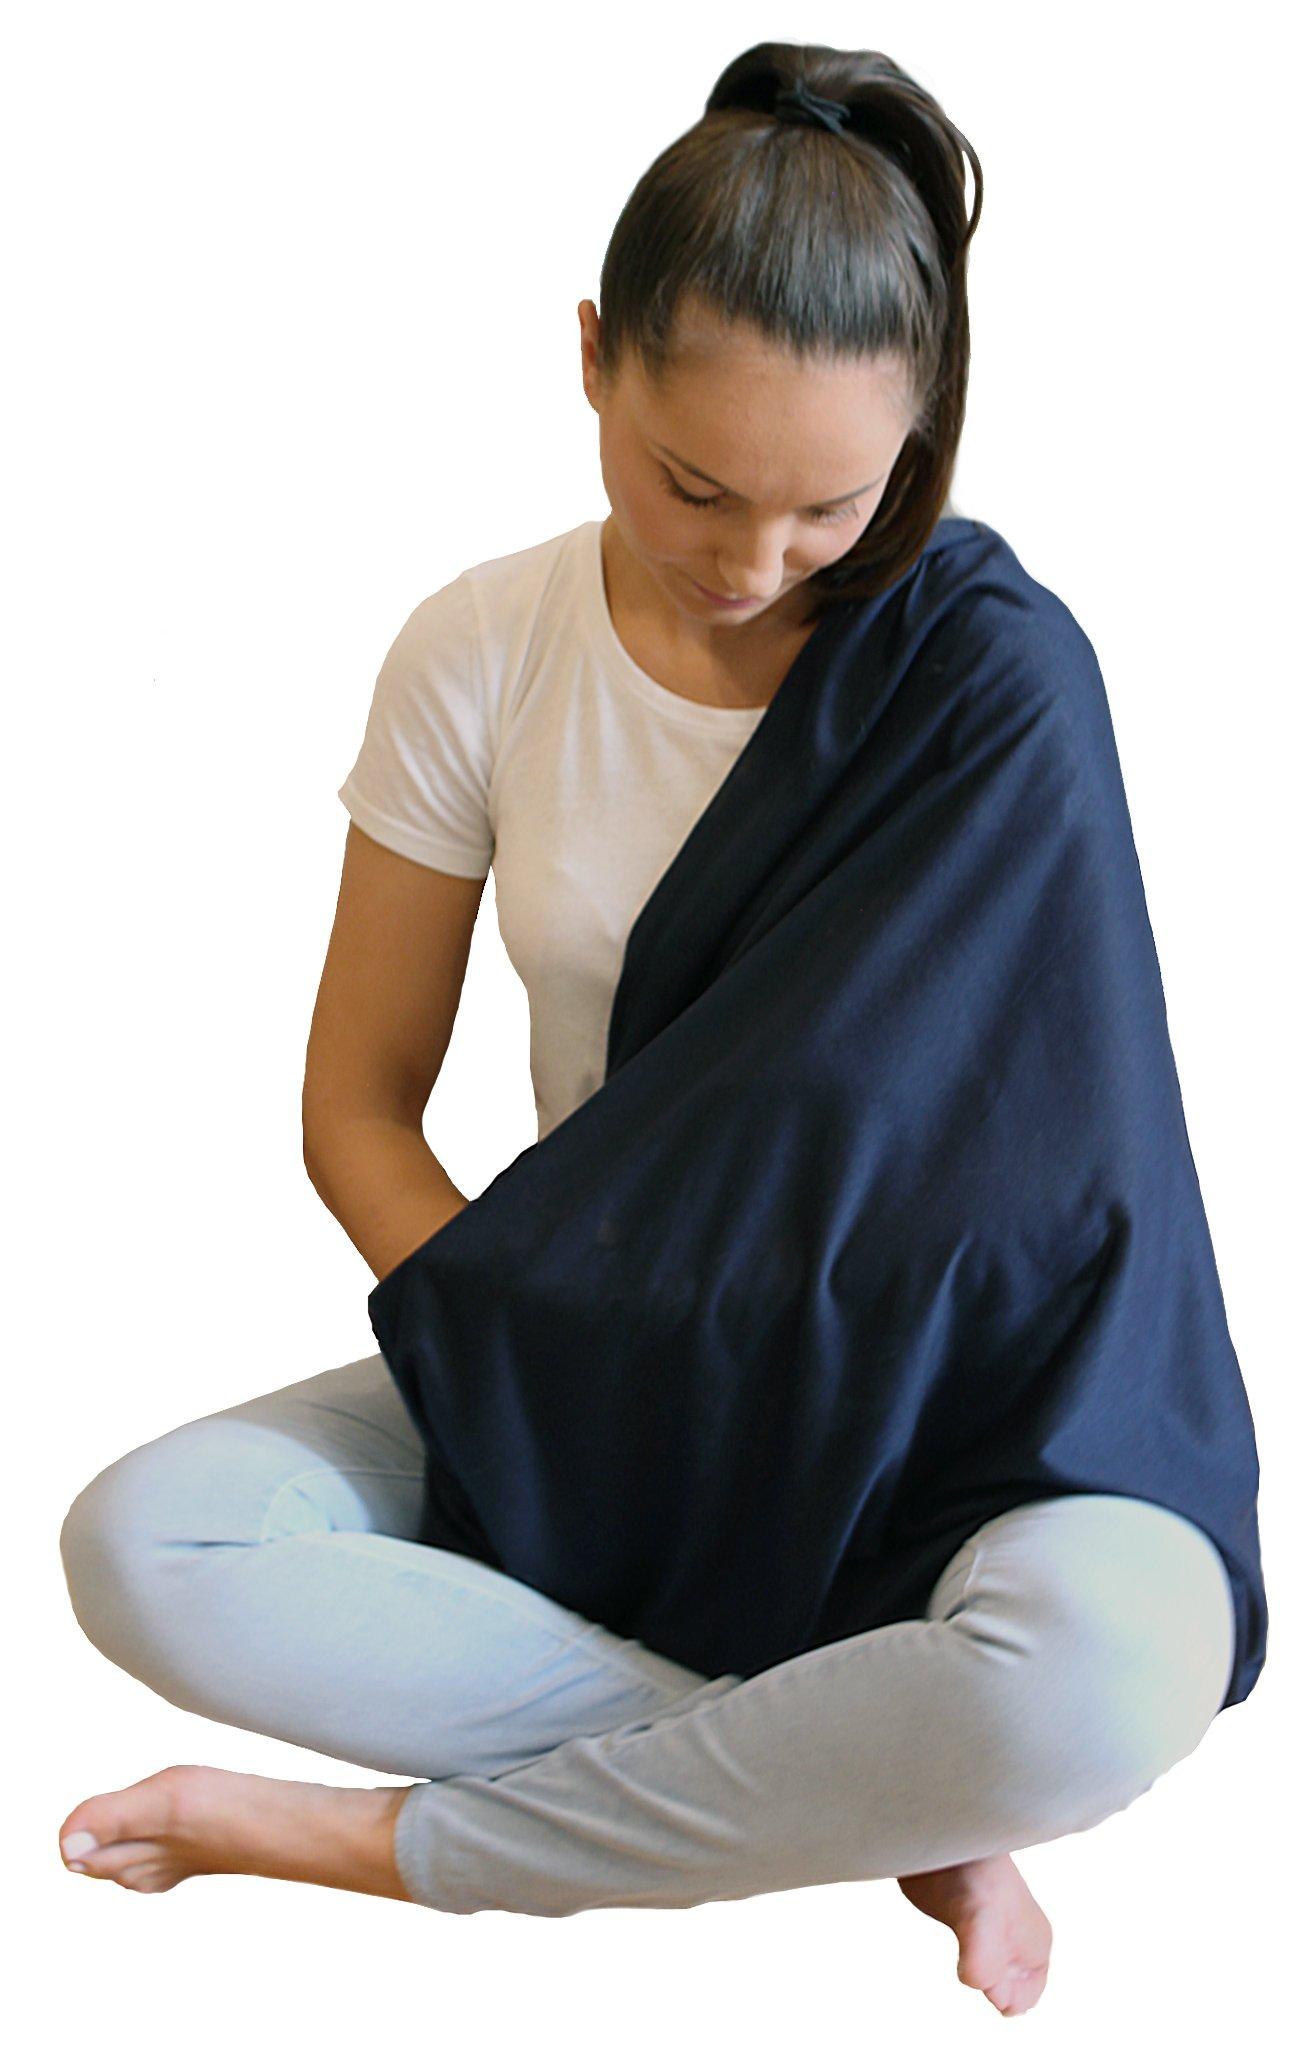 Amazon.com : LK Baby Infinity Nursing Scarf Breastfeeding Cover ...